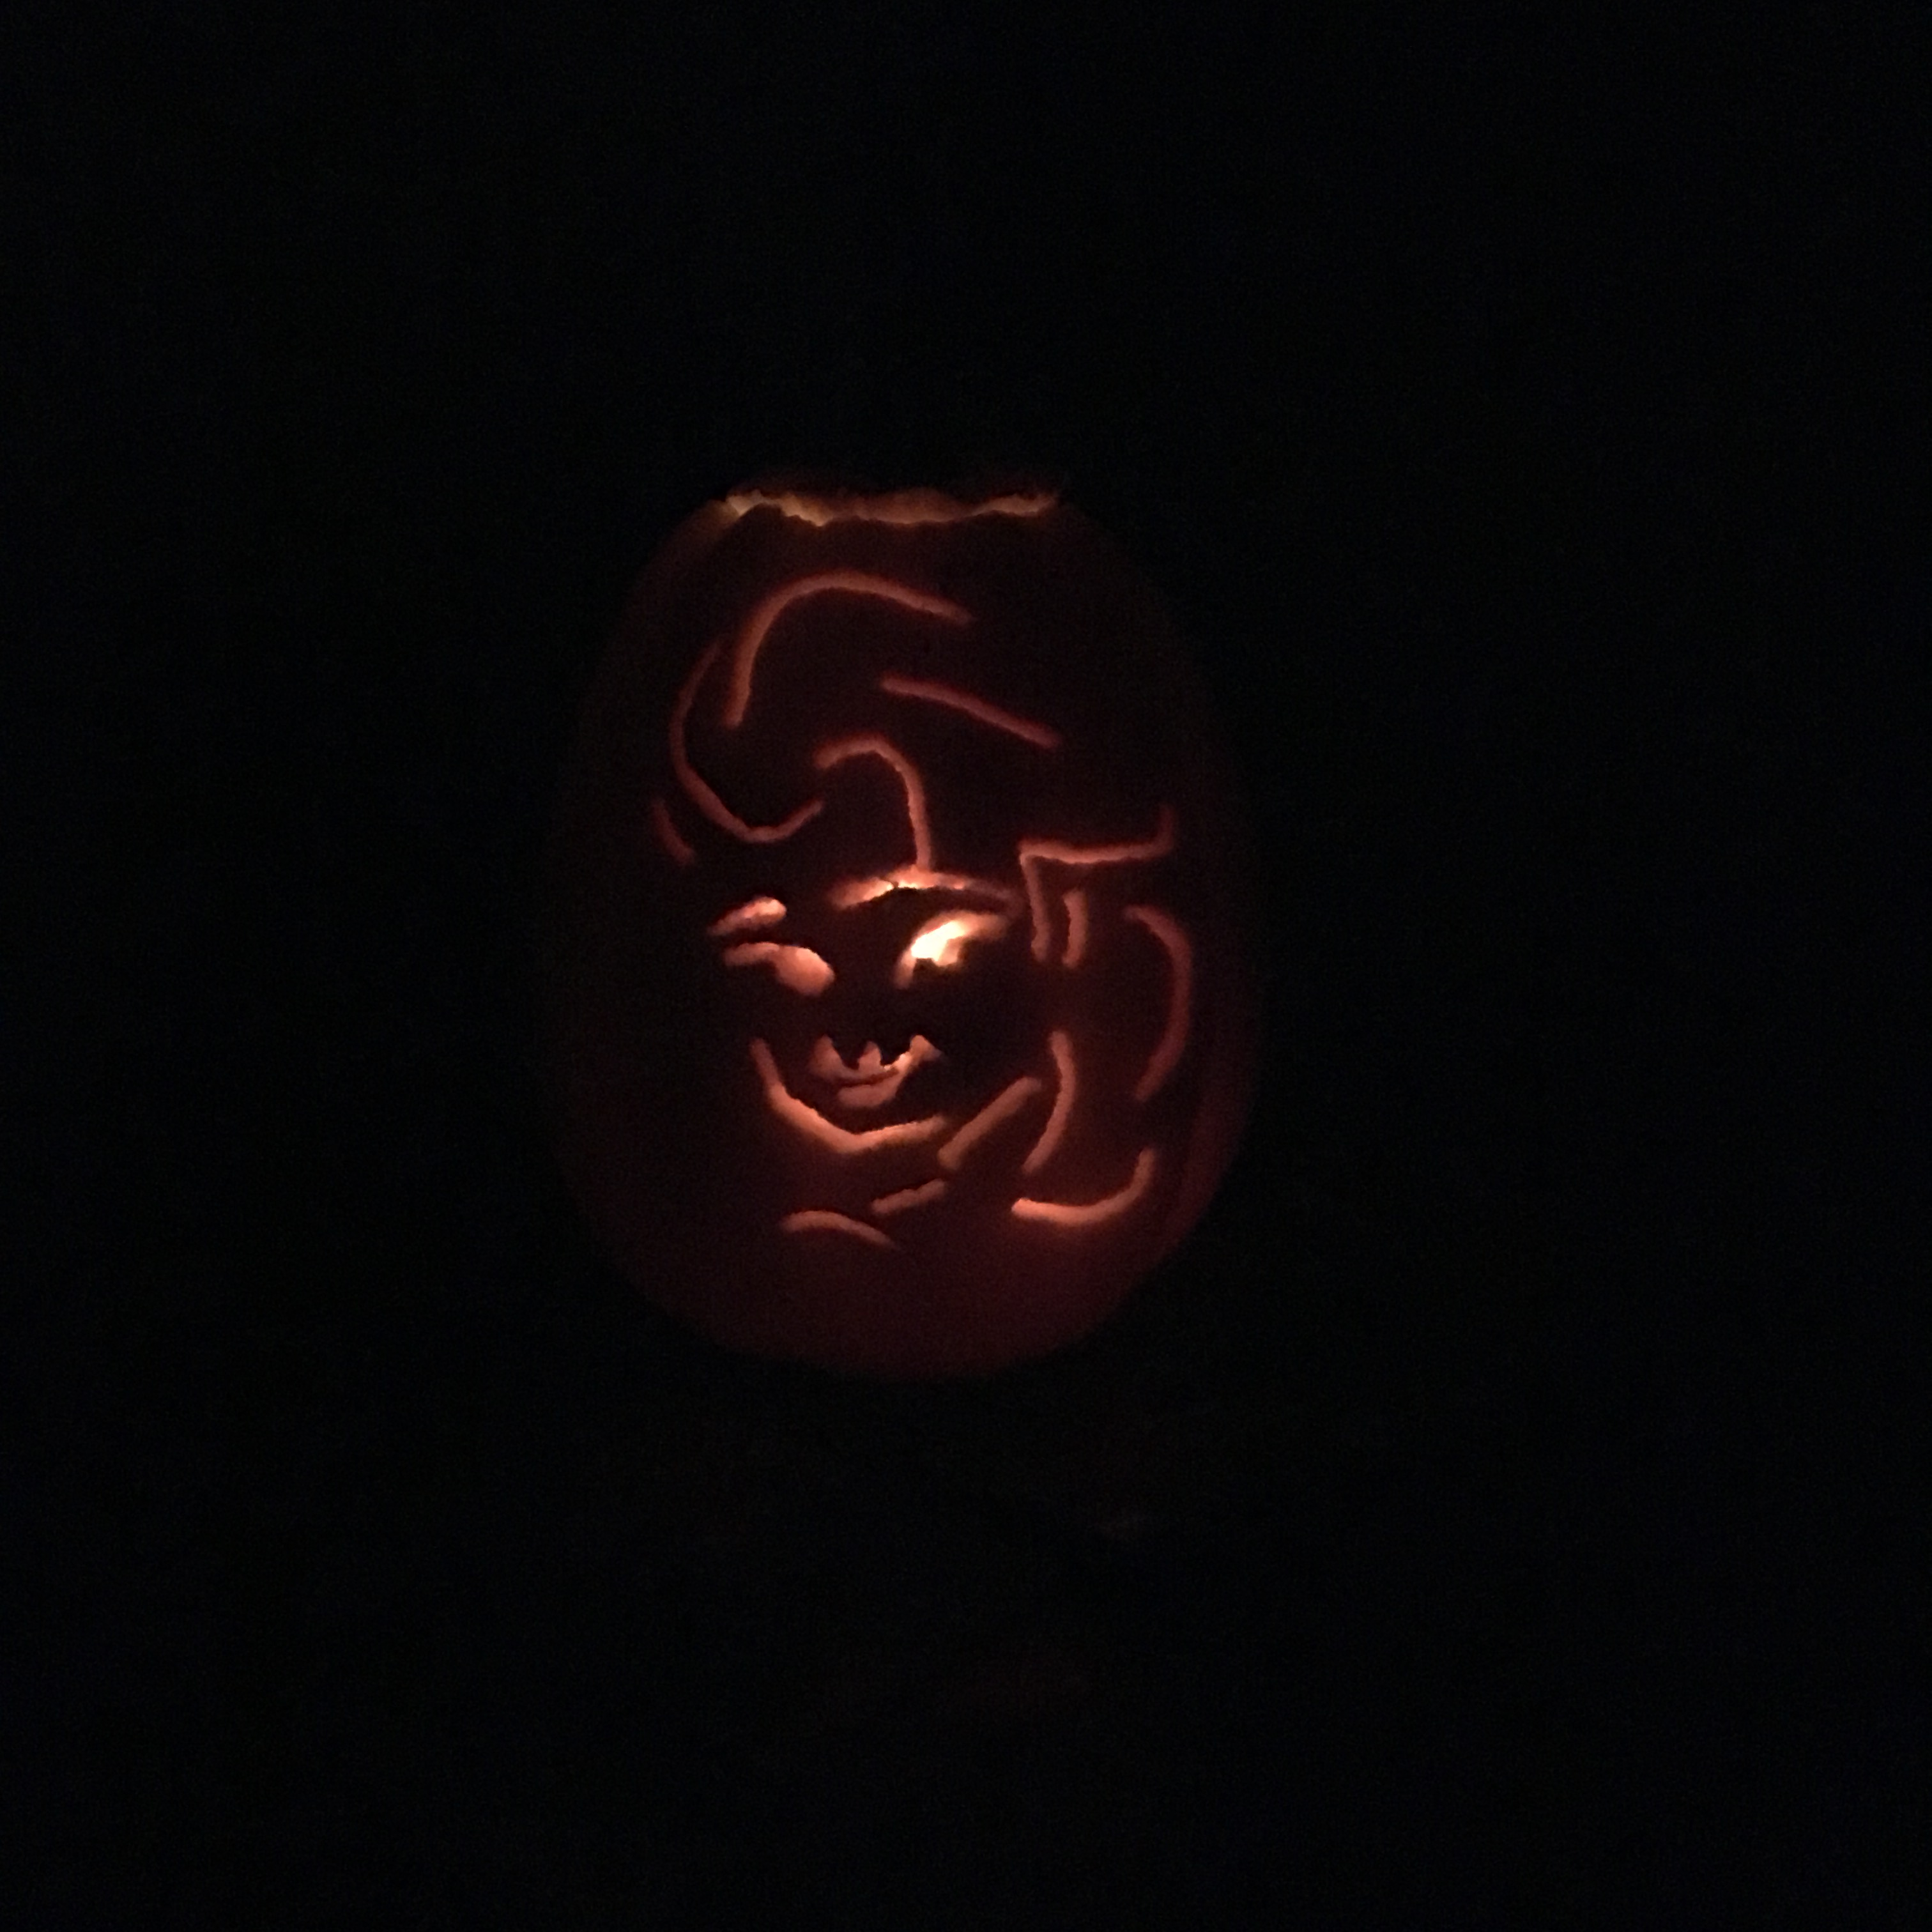 szmk_tok_pumpkin_boba_fett_star_wars_34.JPG